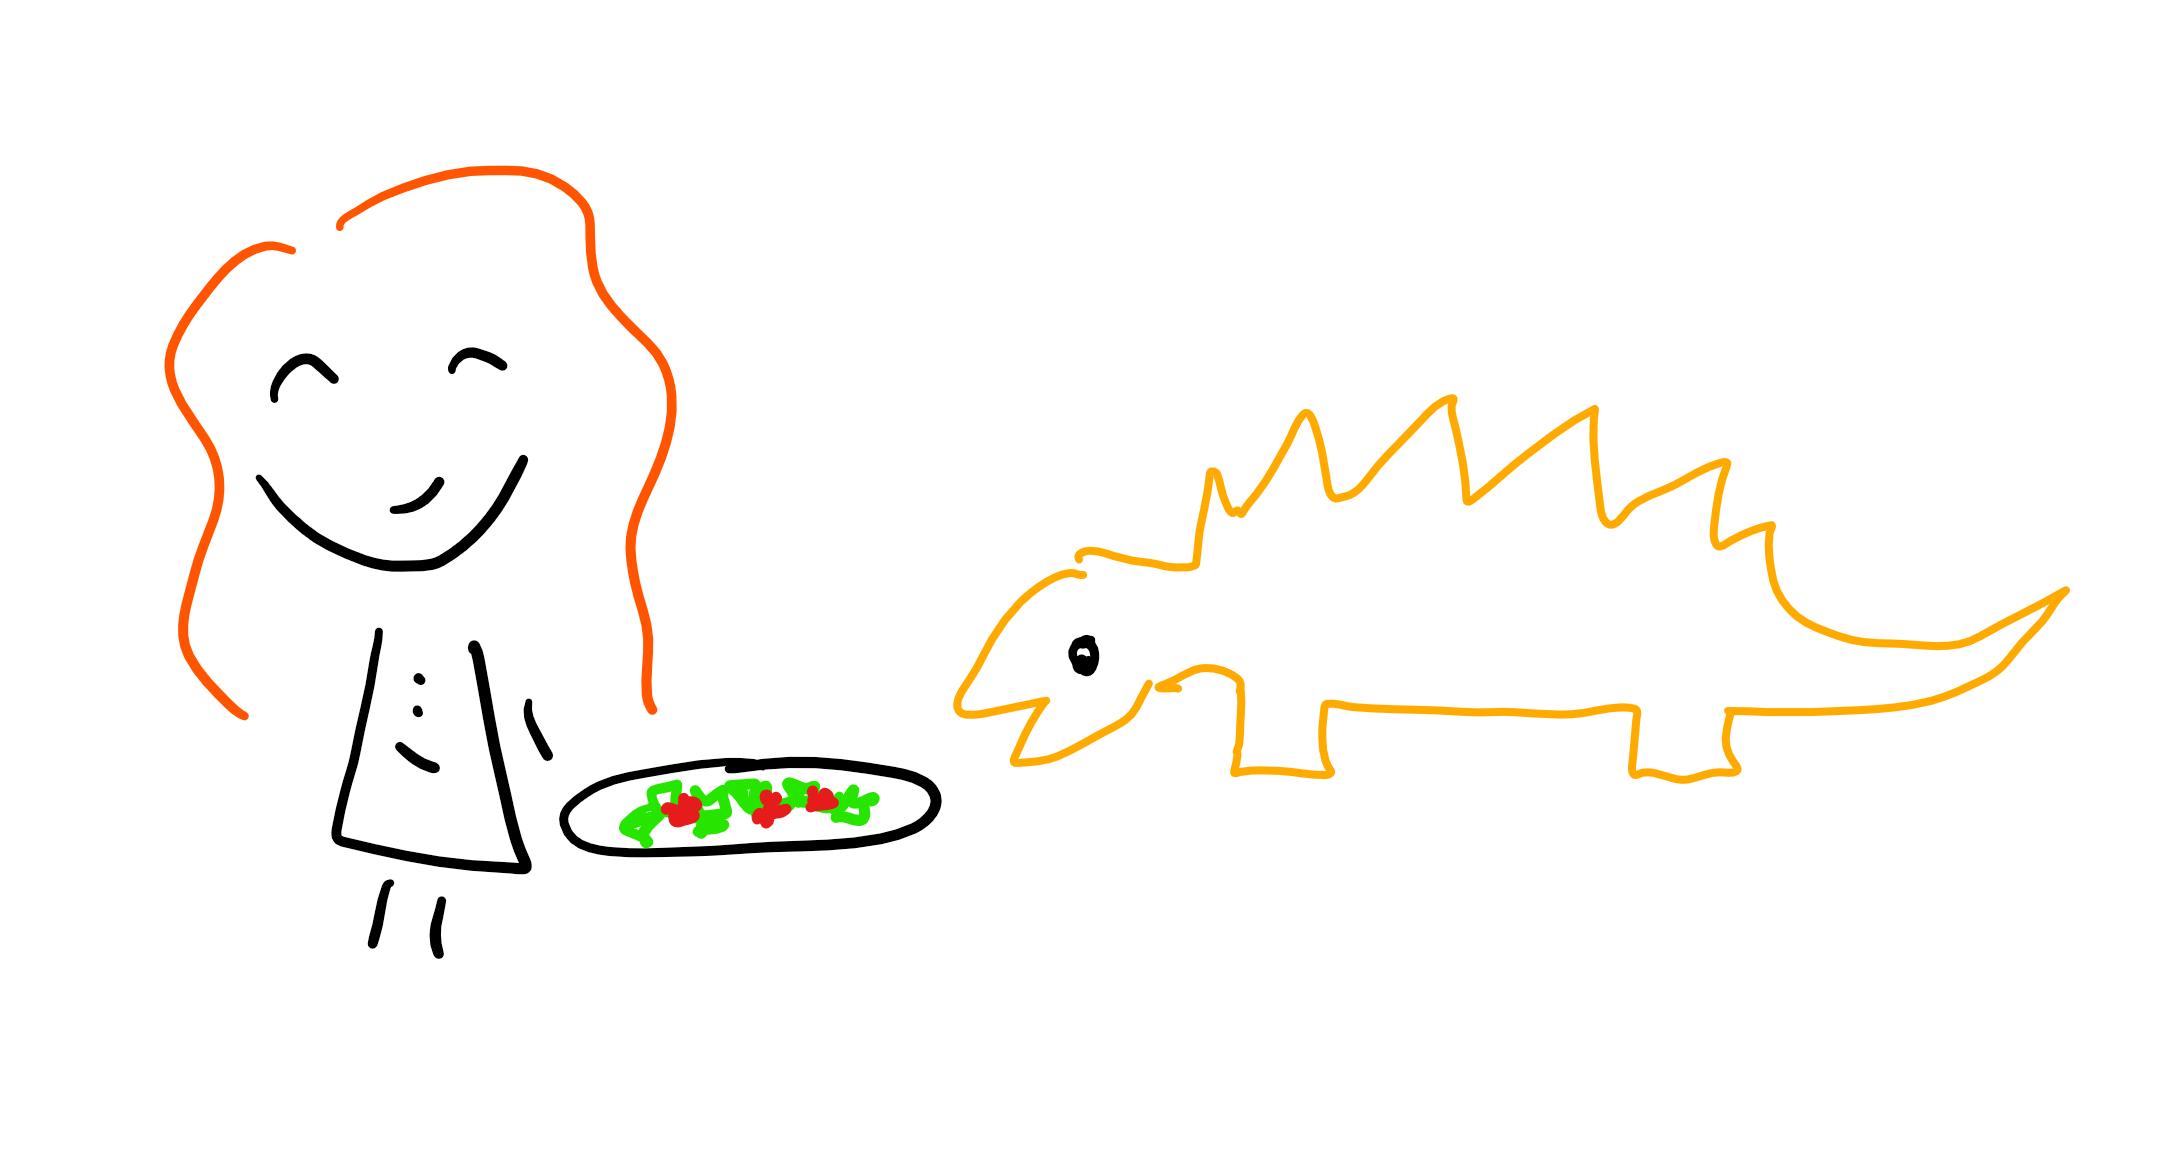 Doodle of auhtor feeding stegosaurus.